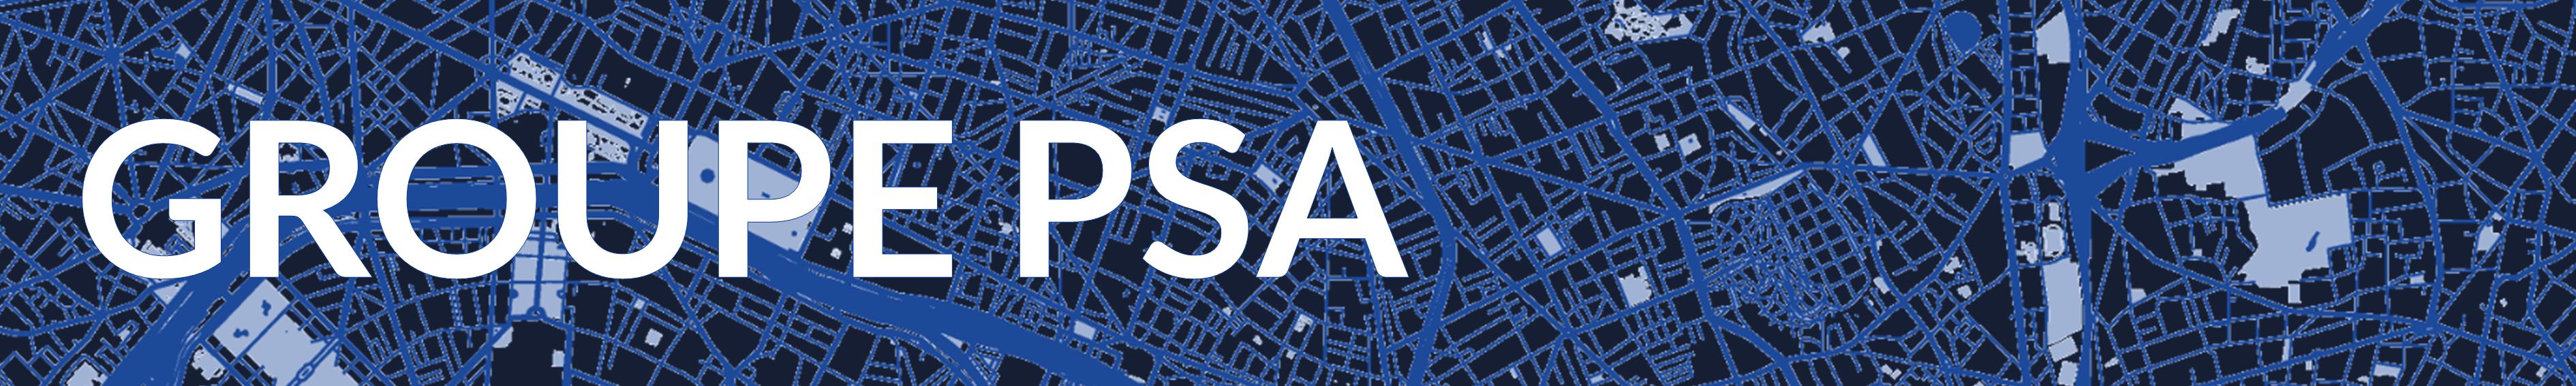 PSA, Groupe PSA, Peugeot, Citroen, DS, Opel, Vauxhall. Automotive trends, Auto industry trends, Automotive market research, Automotive market analysis, auto industry news